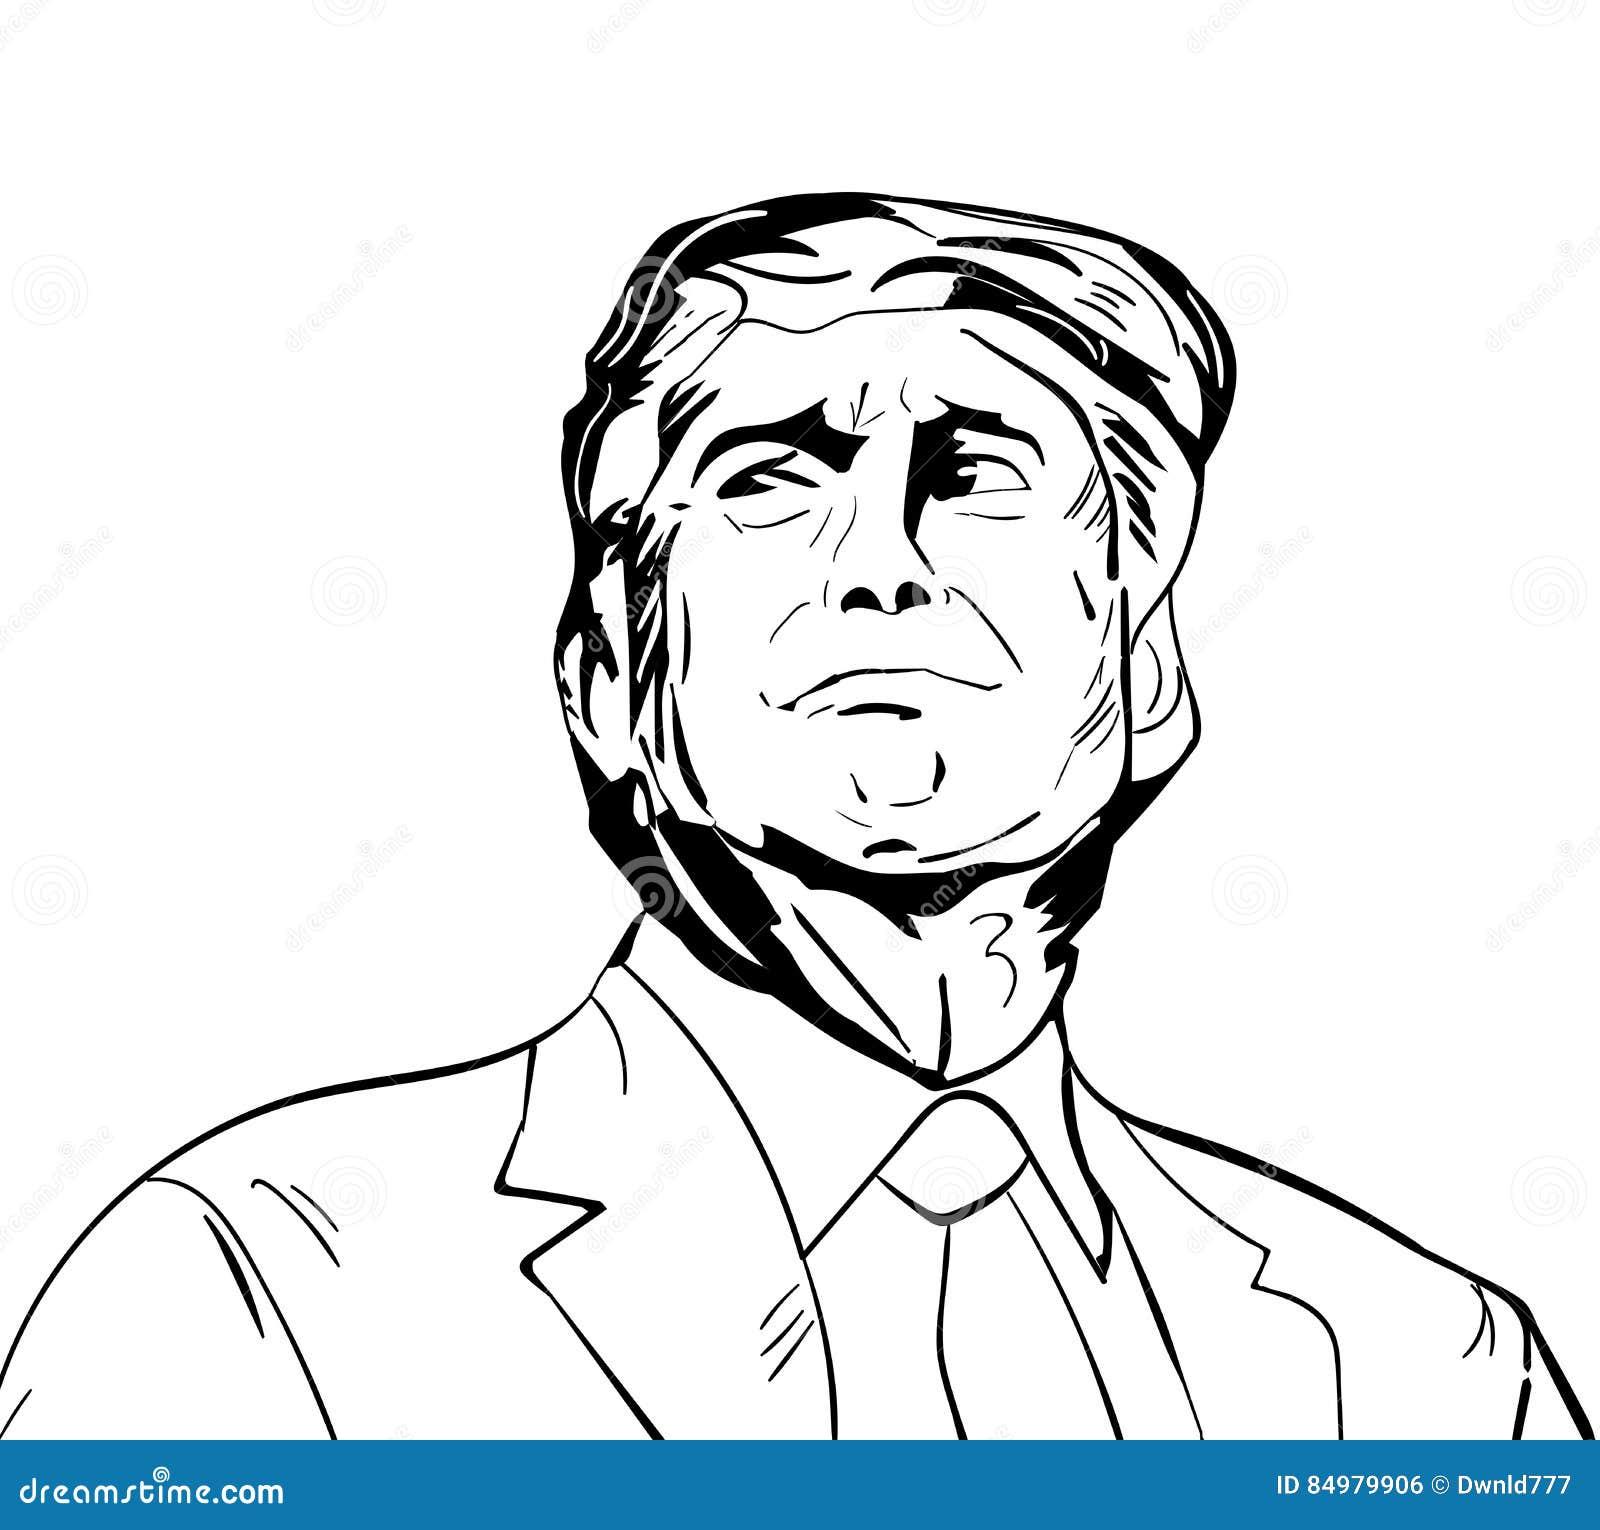 25 januar 2017 illustration amerikanischen präsidenten donald trum